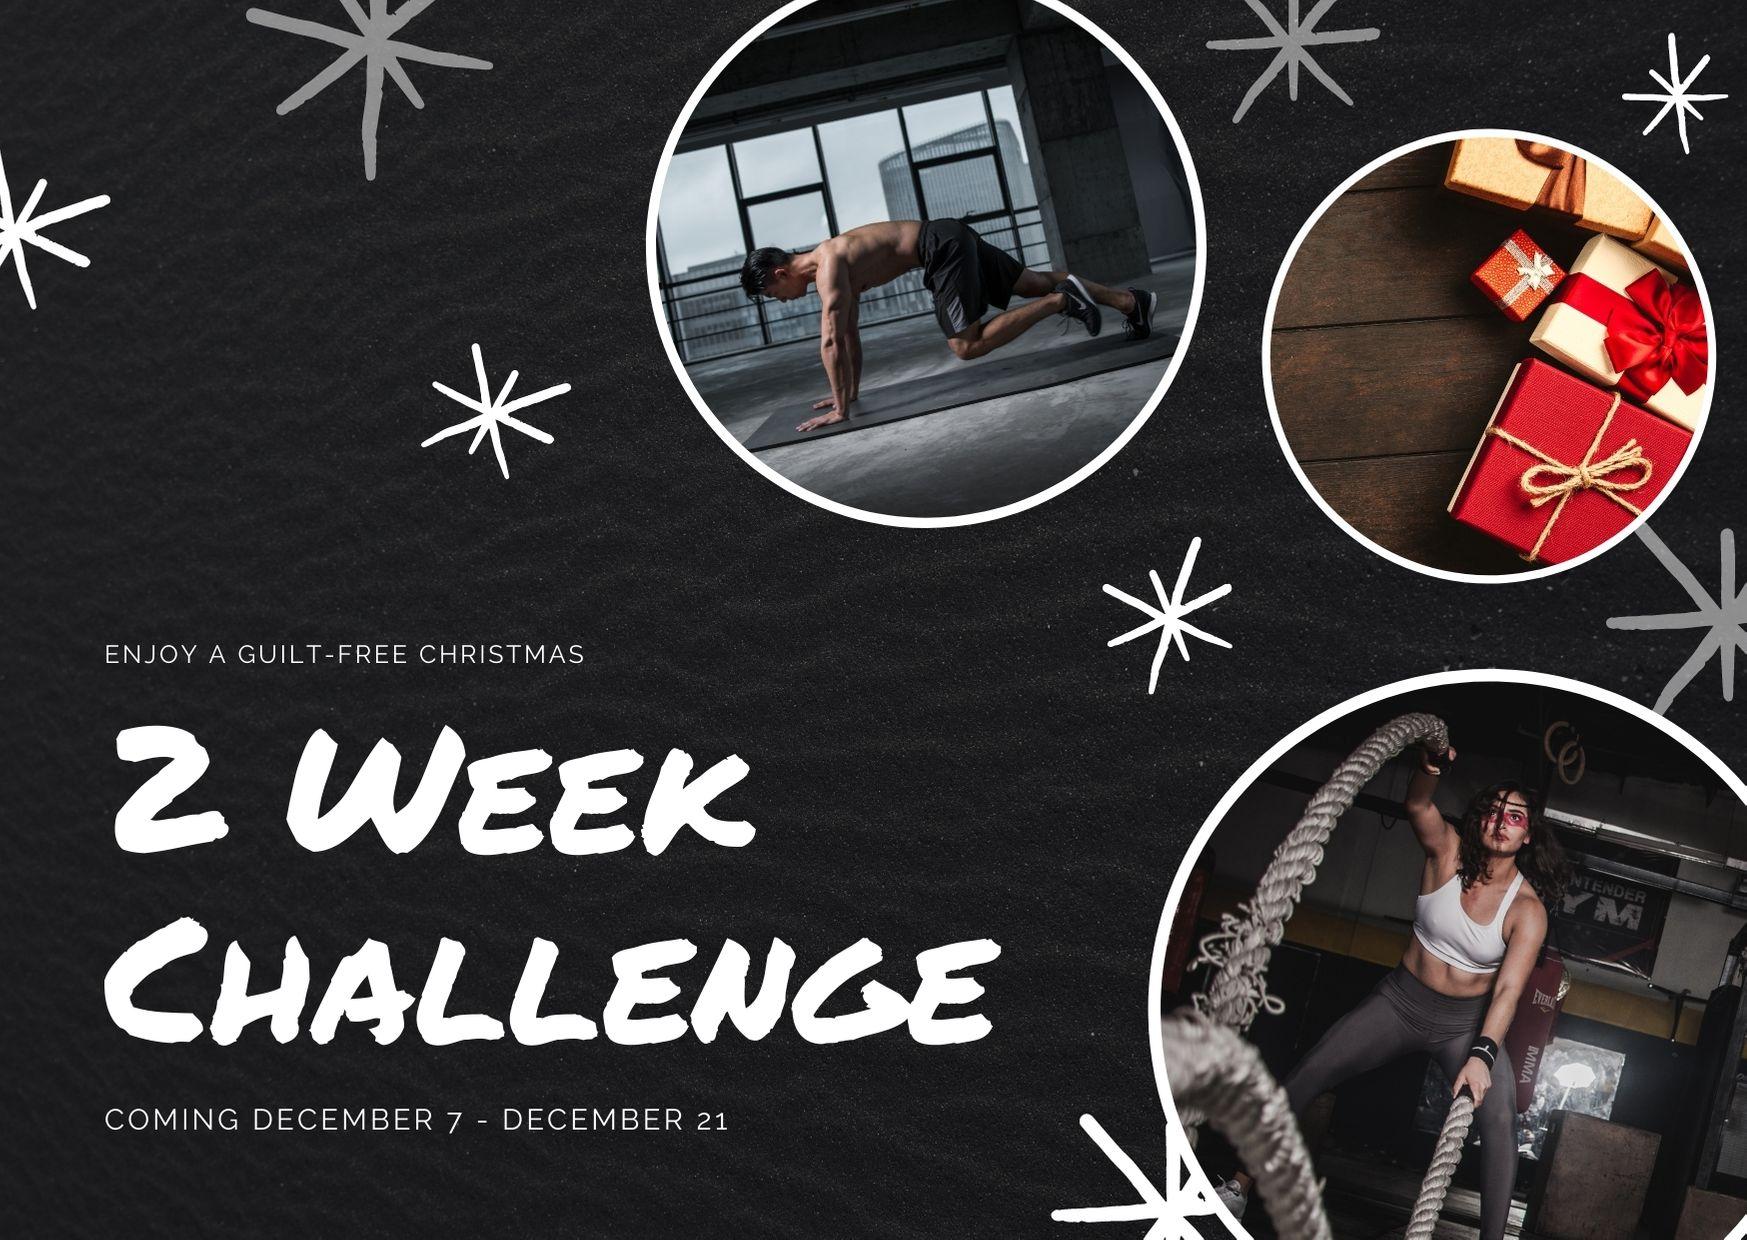 Christmas Promotion Idea For Gym Marketing